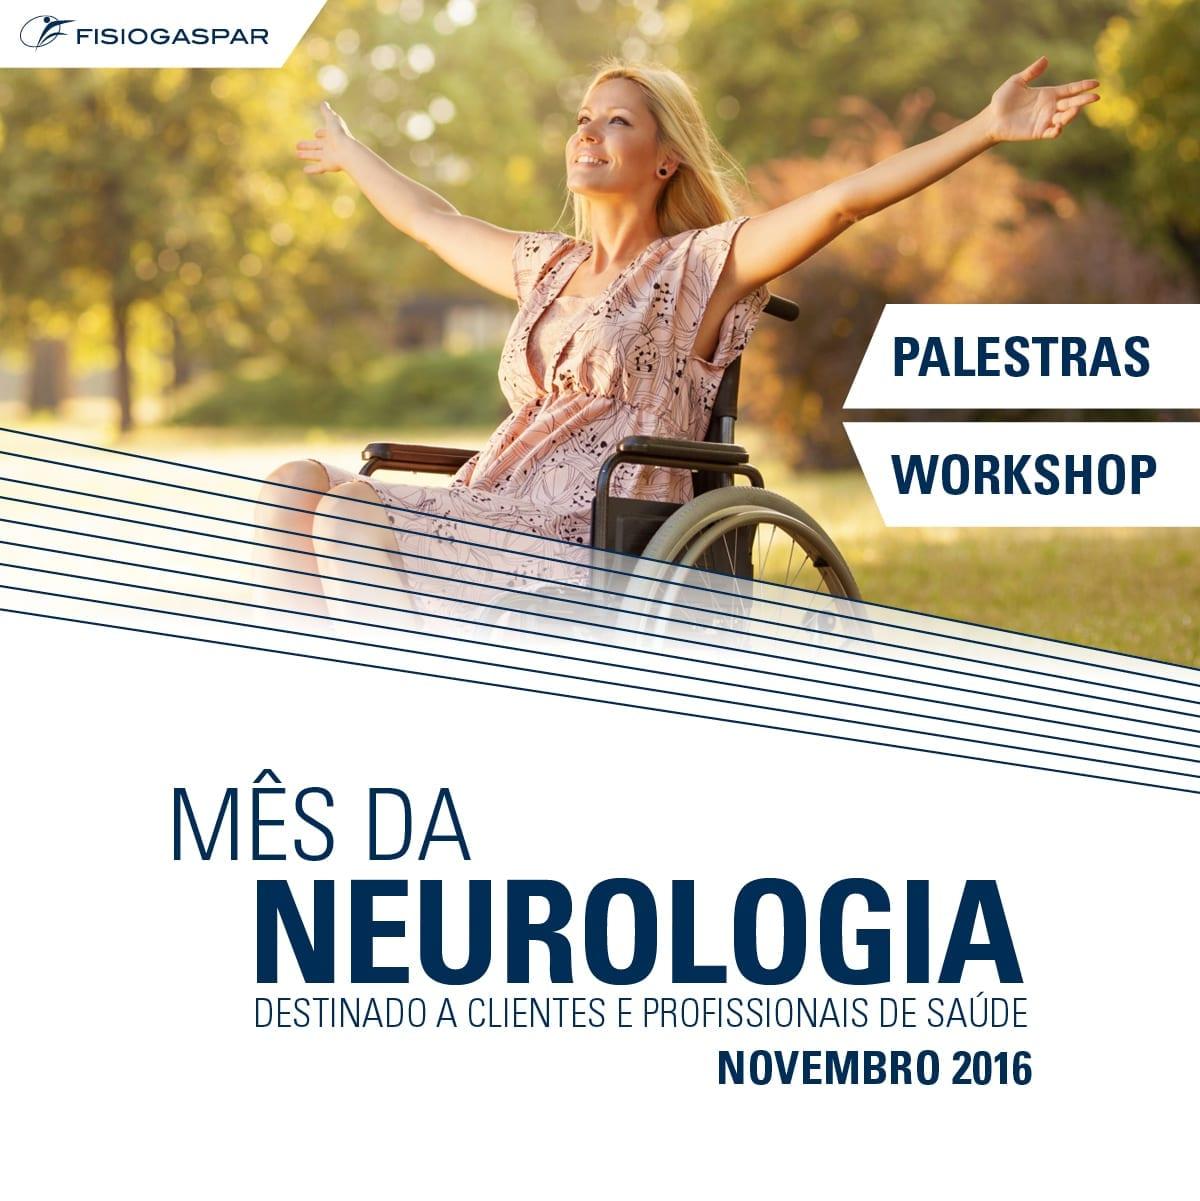 palestras, wokshop mes da neurologia